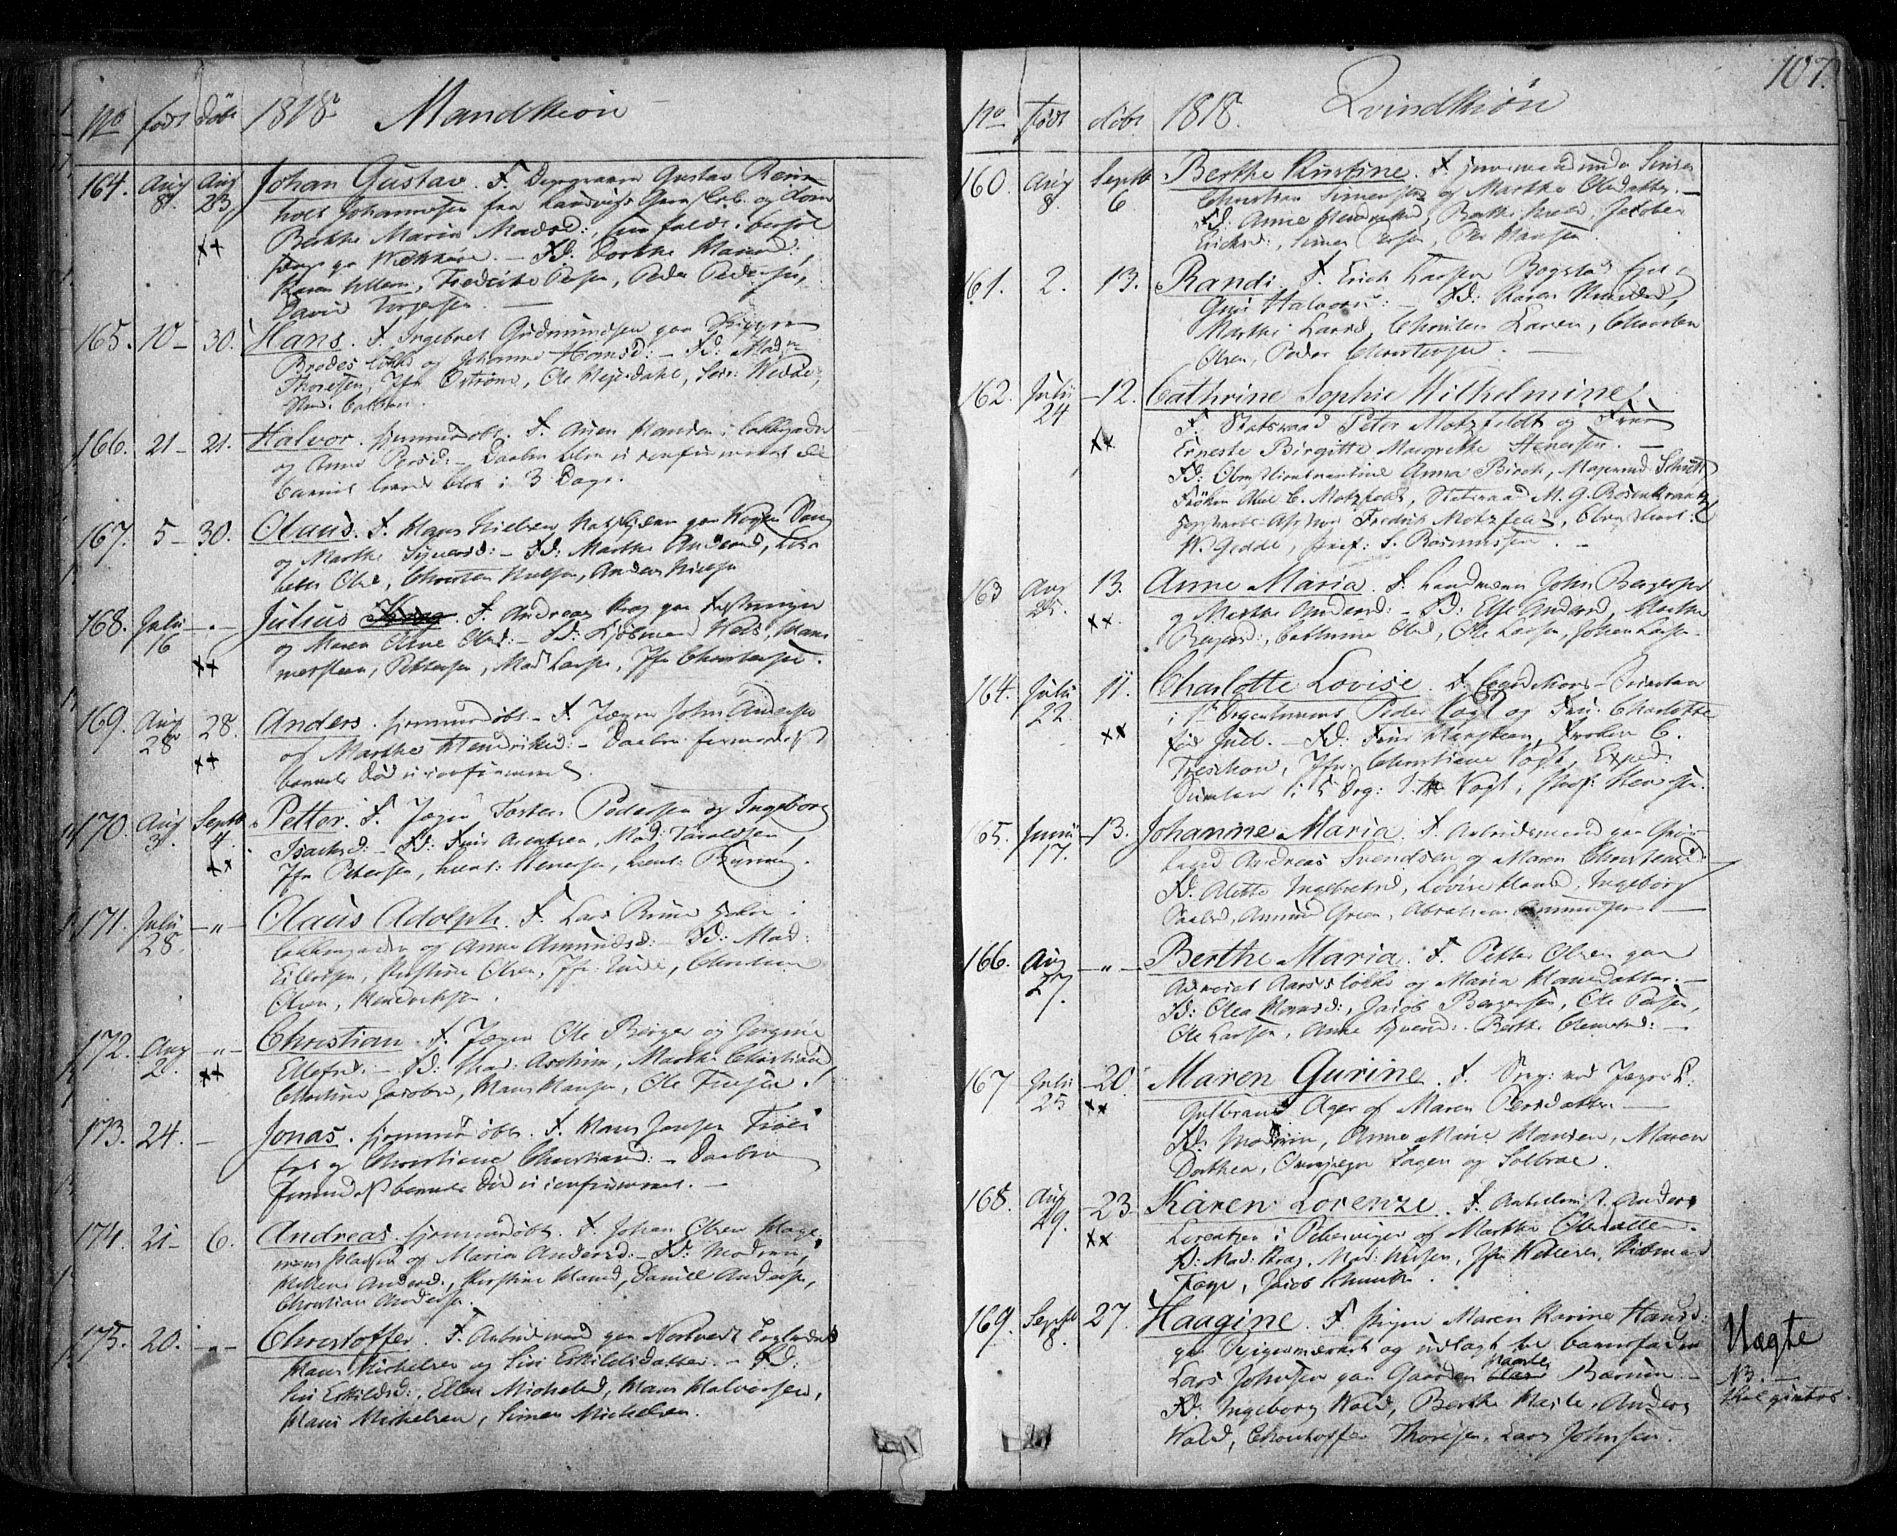 SAO, Aker prestekontor kirkebøker, F/L0011: Parish register (official) no. 11, 1810-1819, p. 107